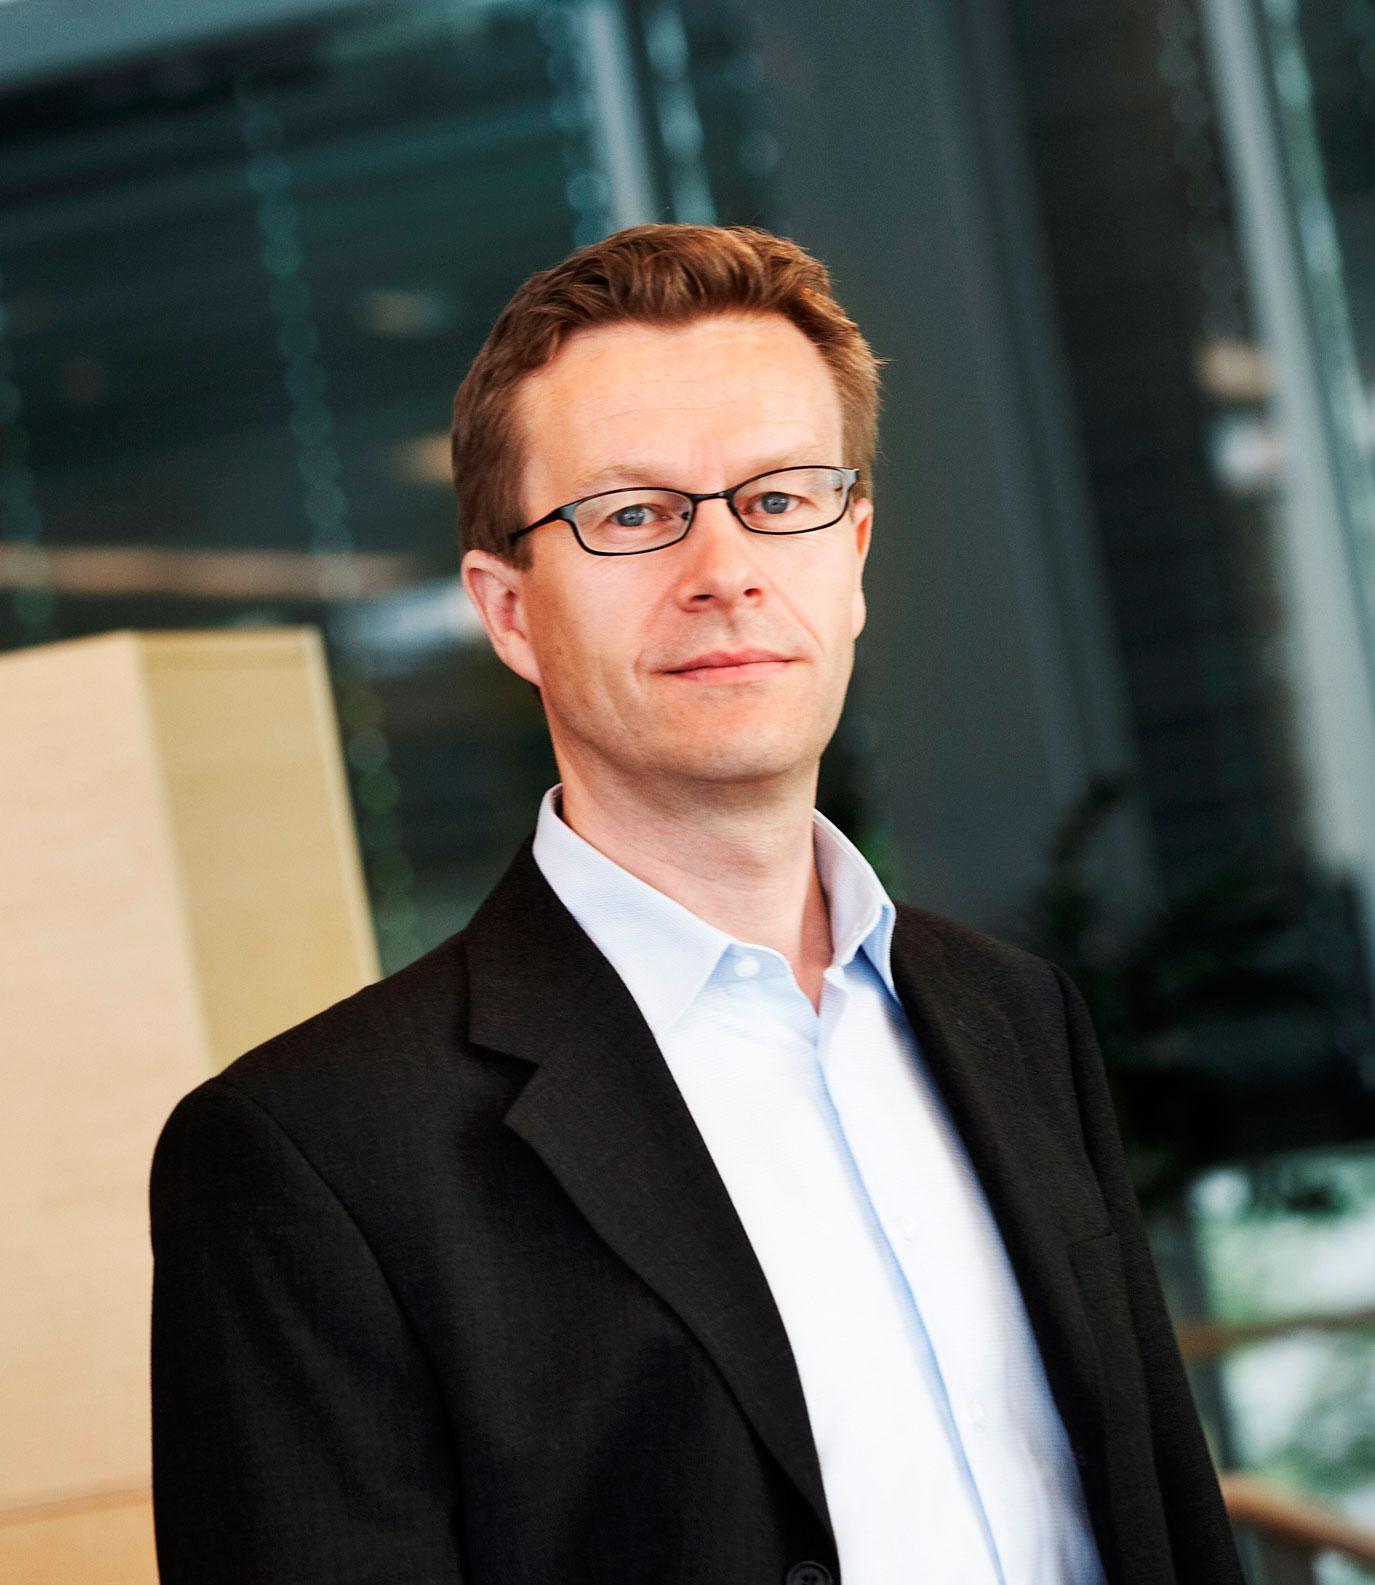 Administrerende direktør Aksel Aanensen i Ericsson i Norge.Foto: Ericsson